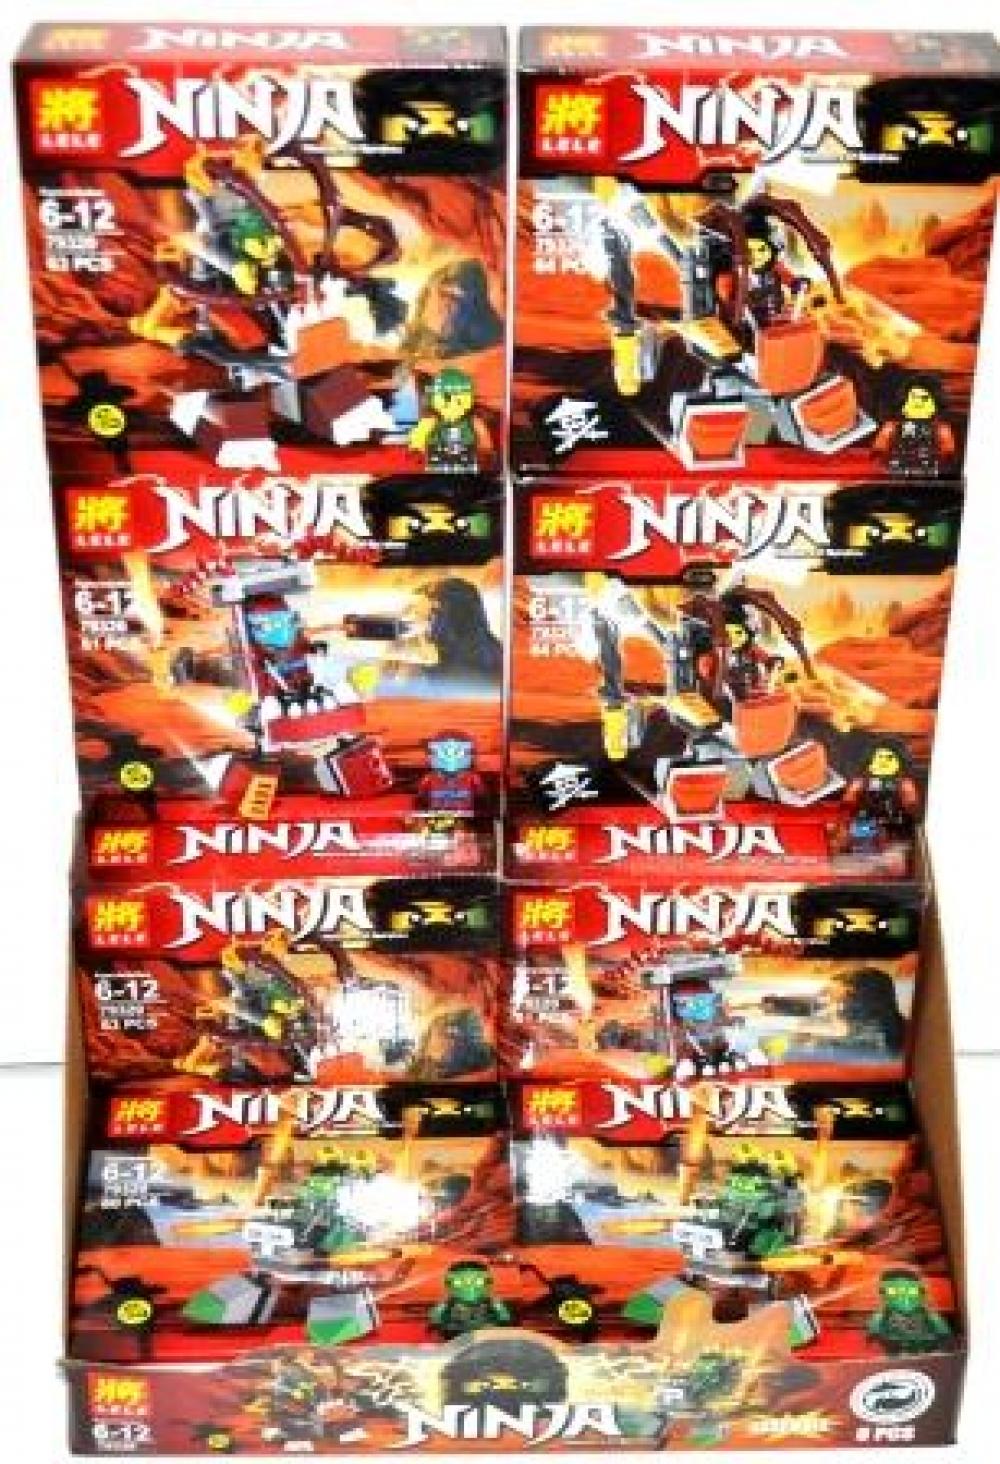 https://g-ua.org/nikitatoys/uploads/attachments/2019/11/19/1574133994_konstruktor-ninja-6v1-3003--104.jpg